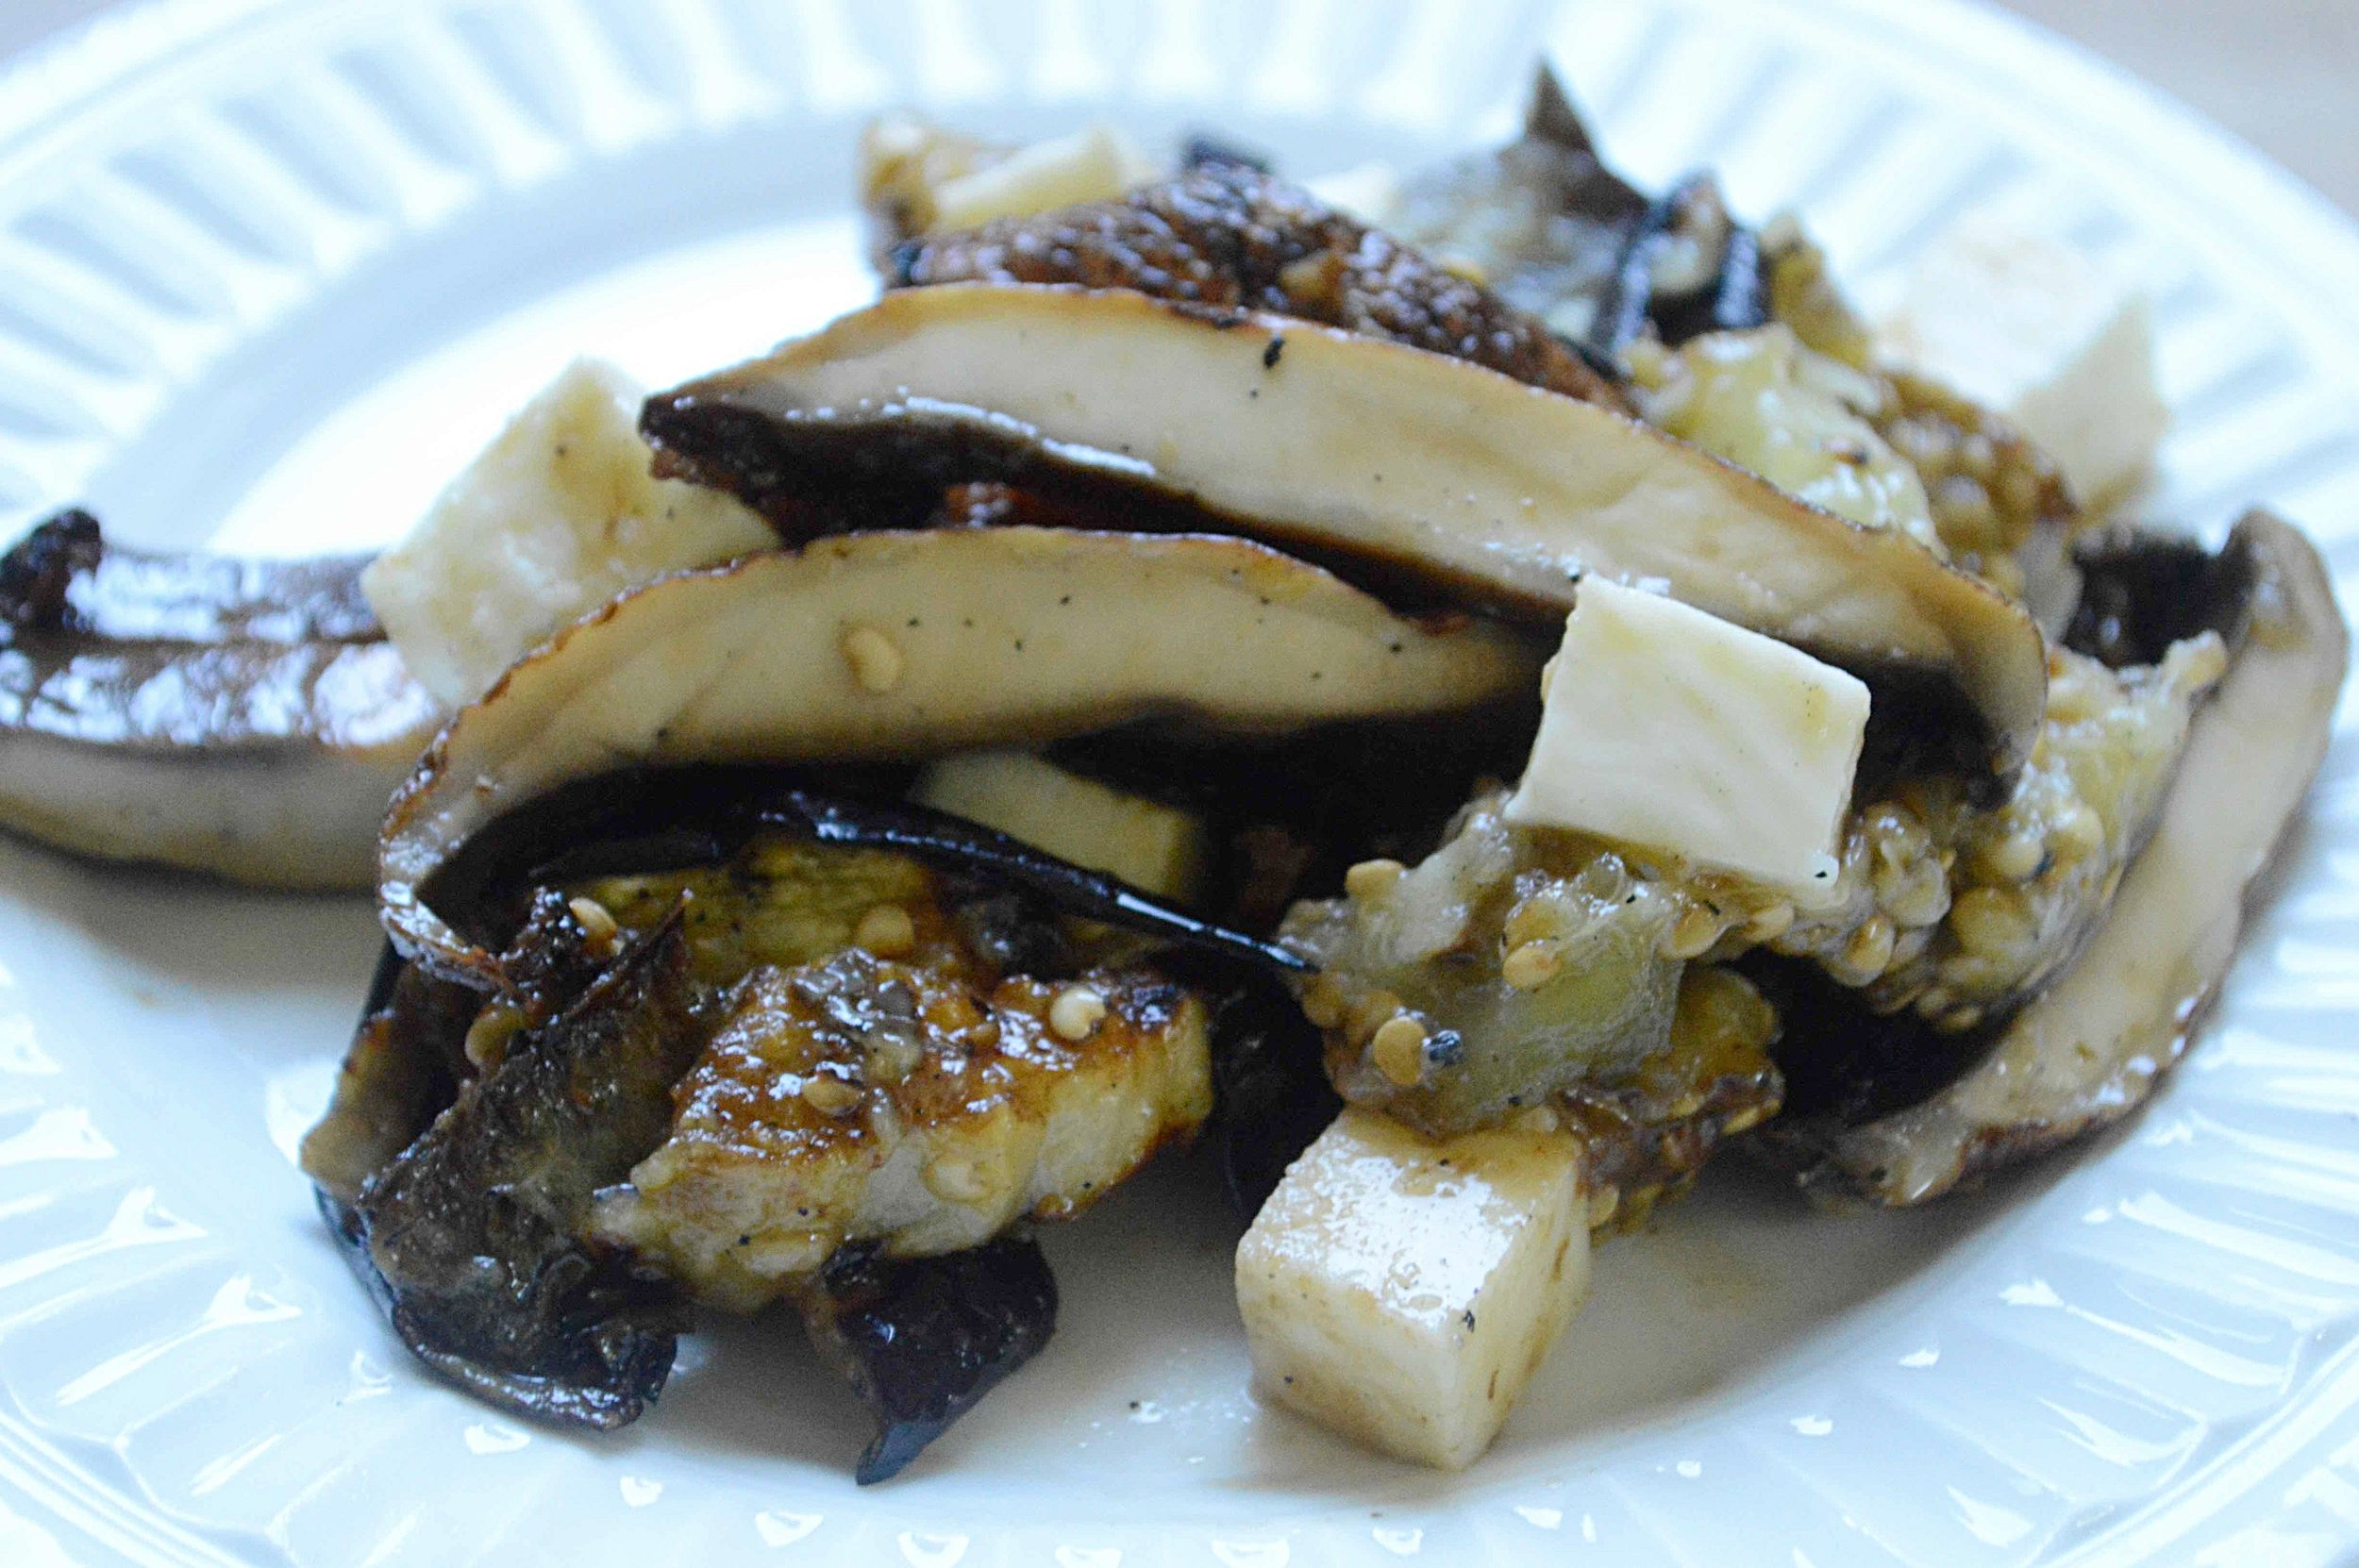 Grilled Eggplant, Portobello and Fresh Mozzarella Salad